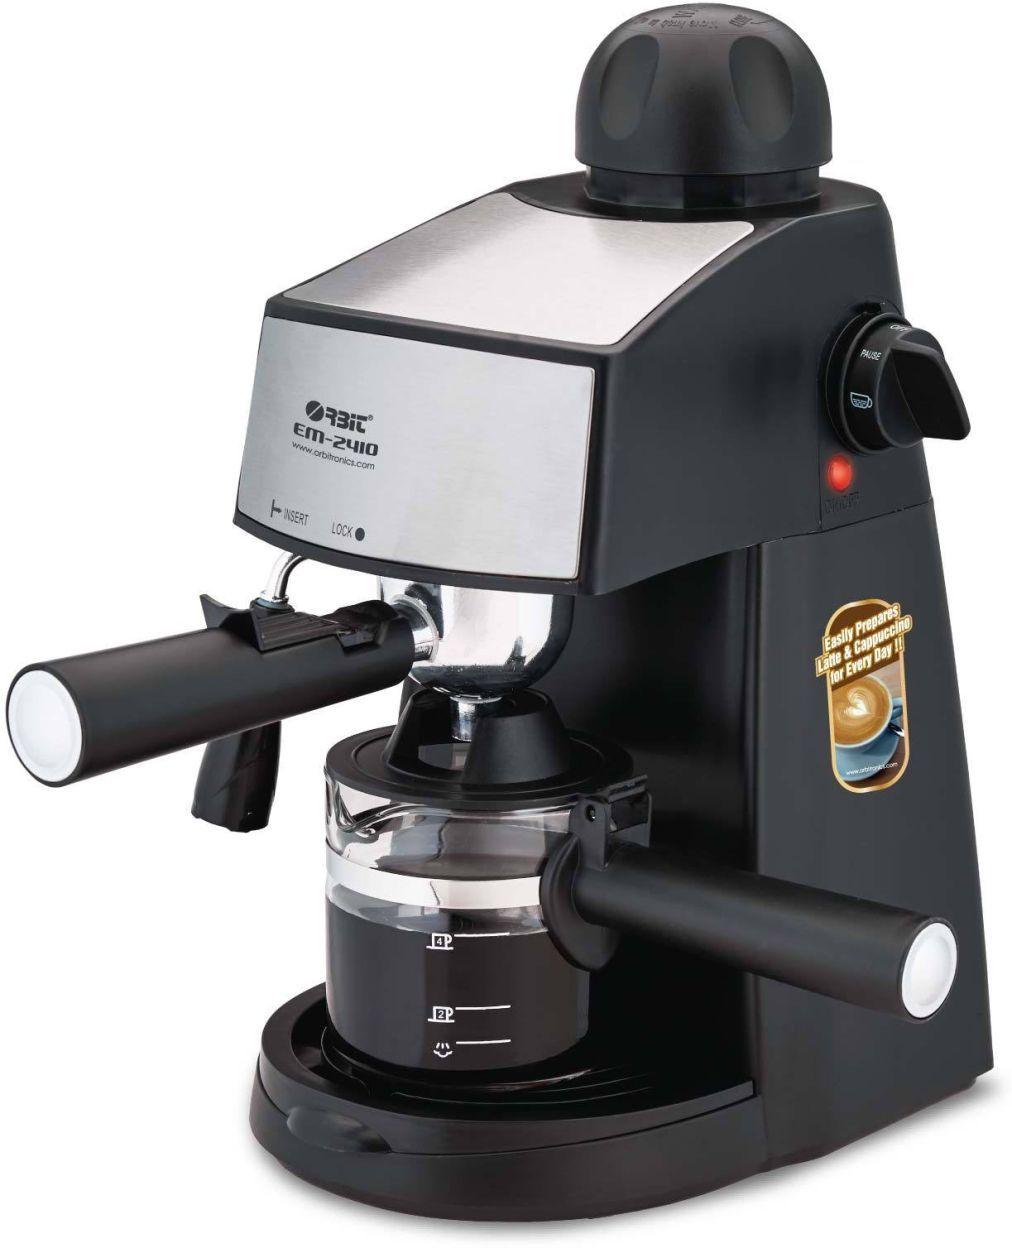 Orbit EM-2410 4 Cups Coffee Maker